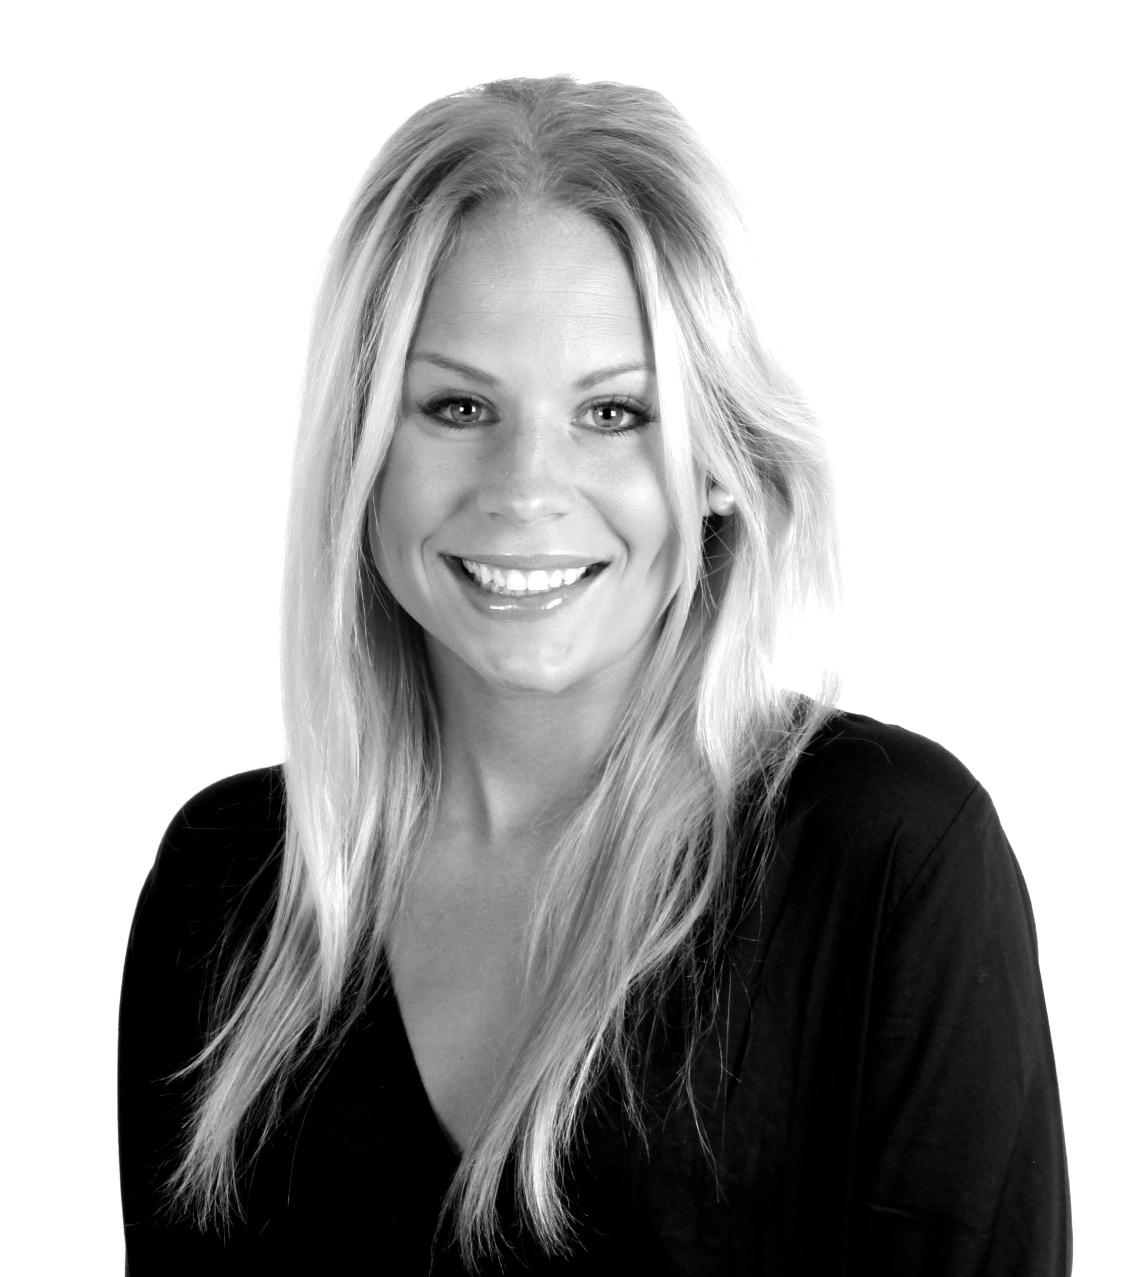 Lovisa Knutsson